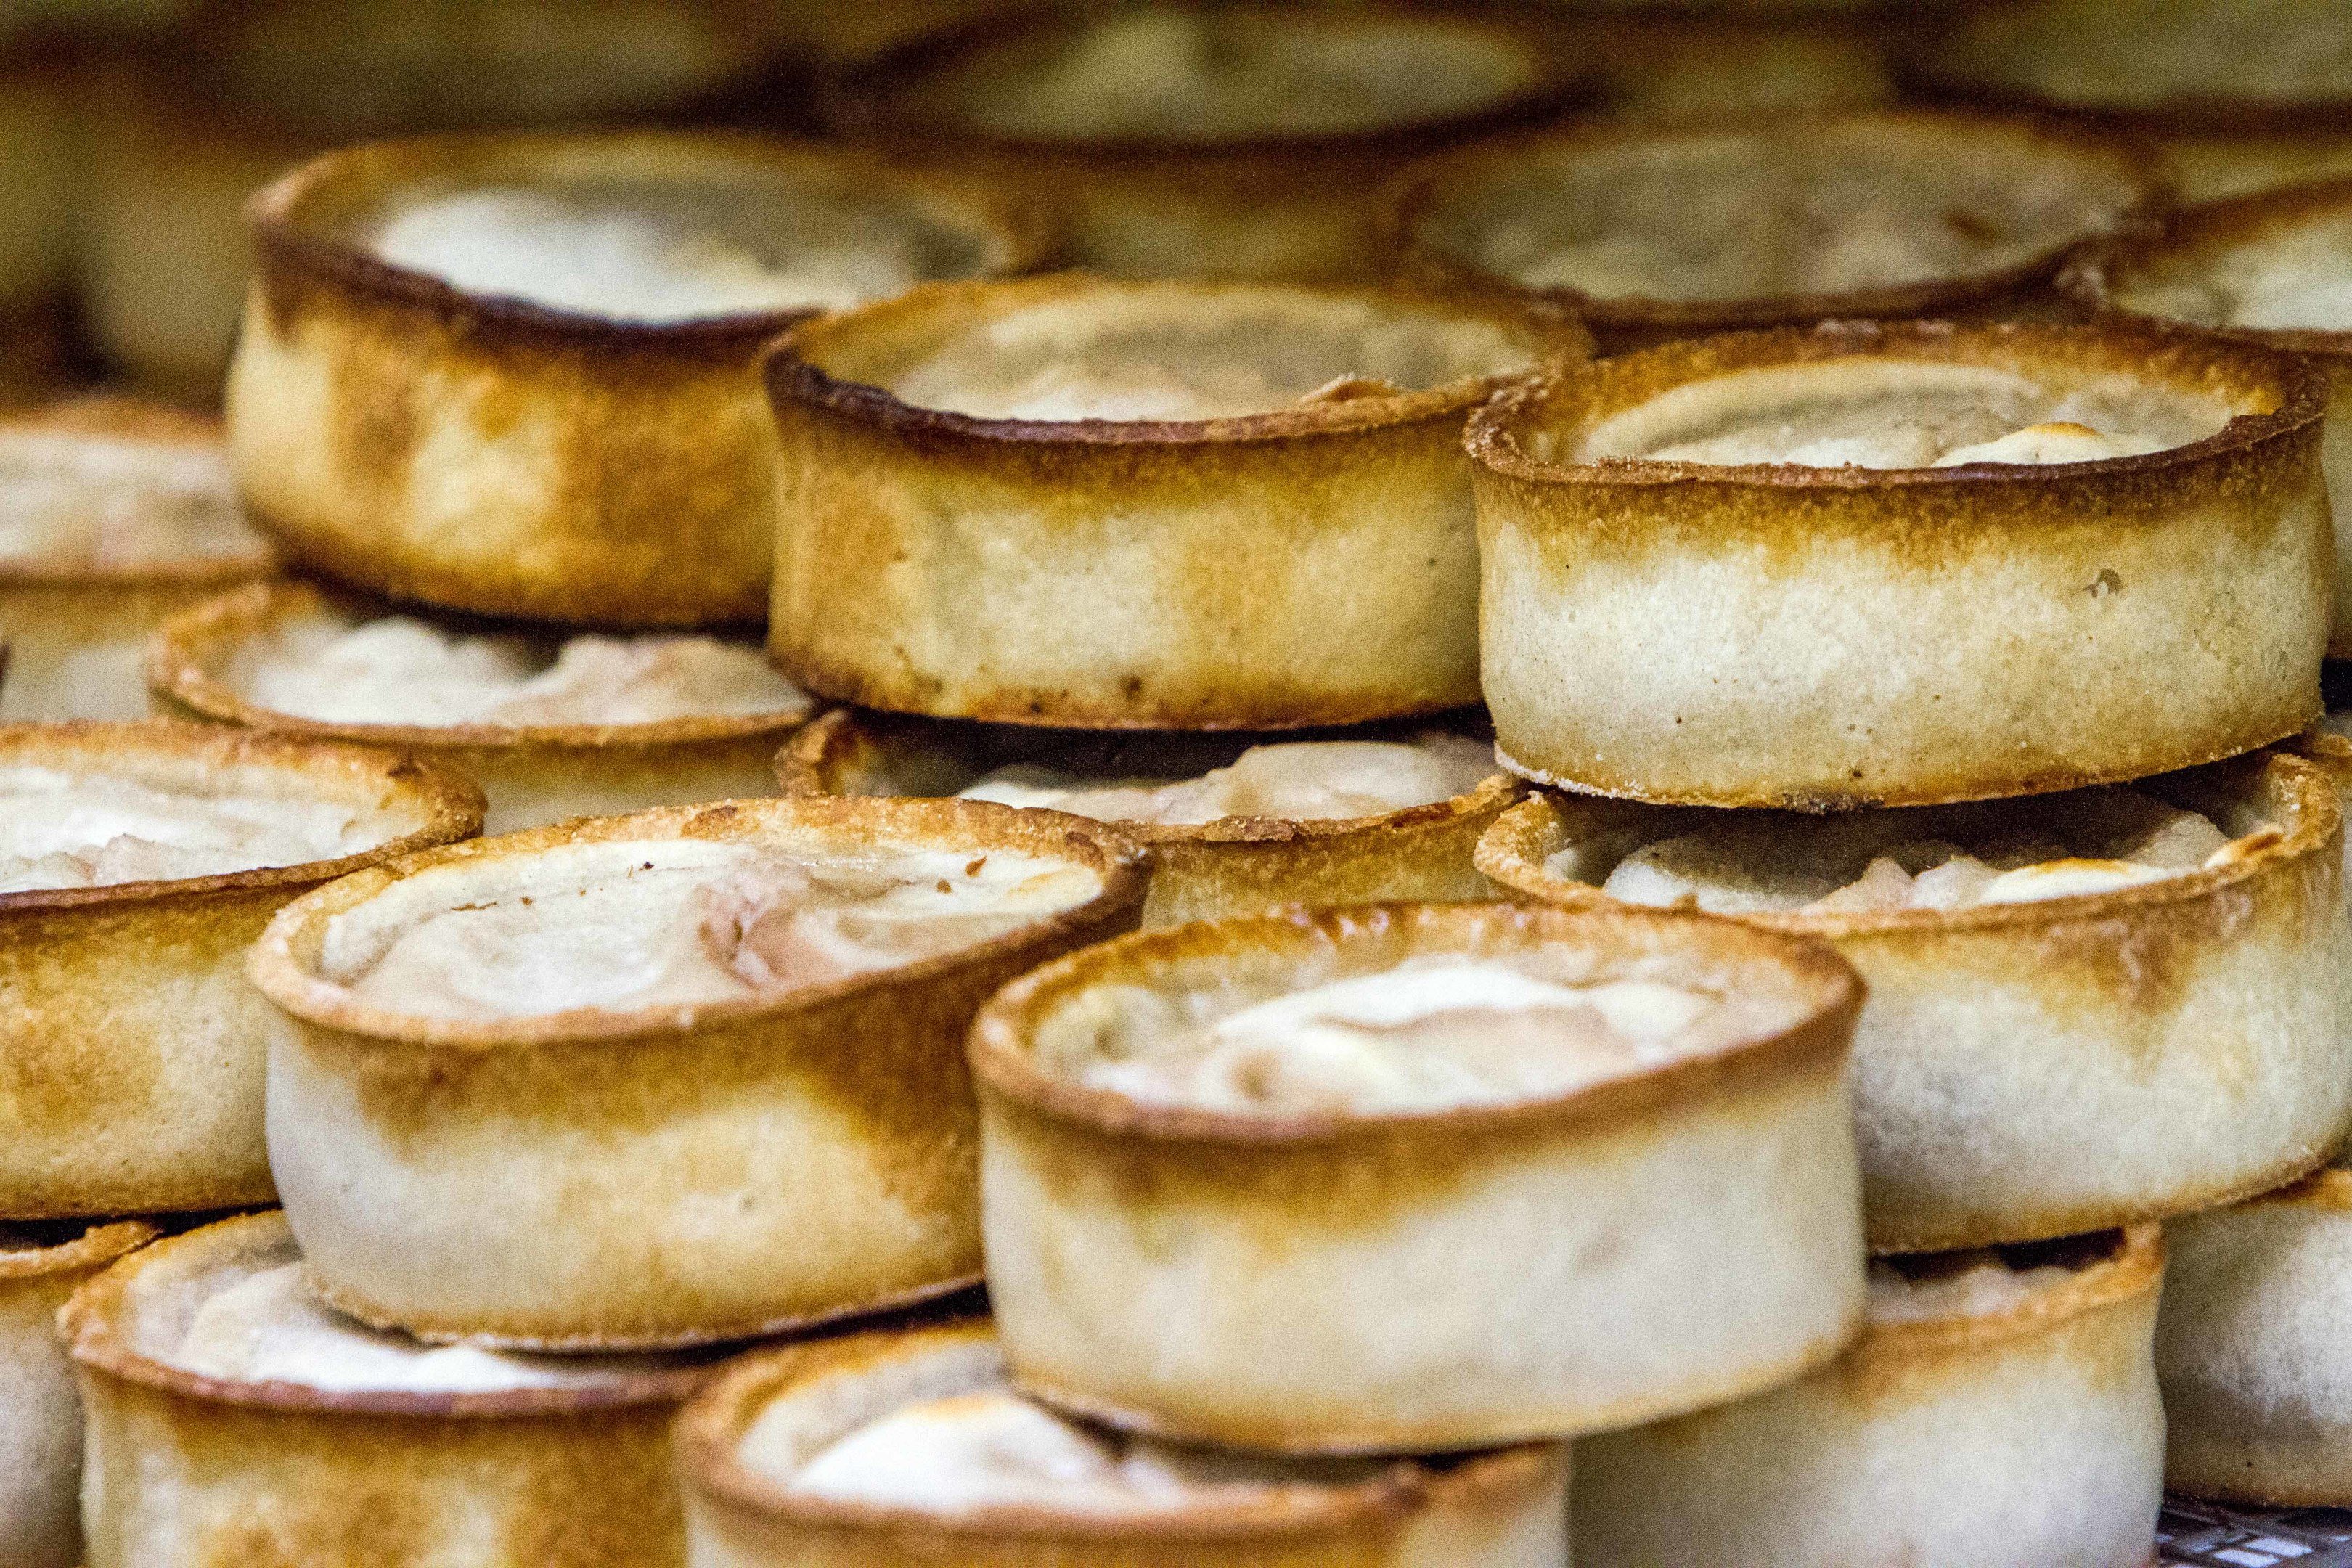 Pies. Lots of pies.